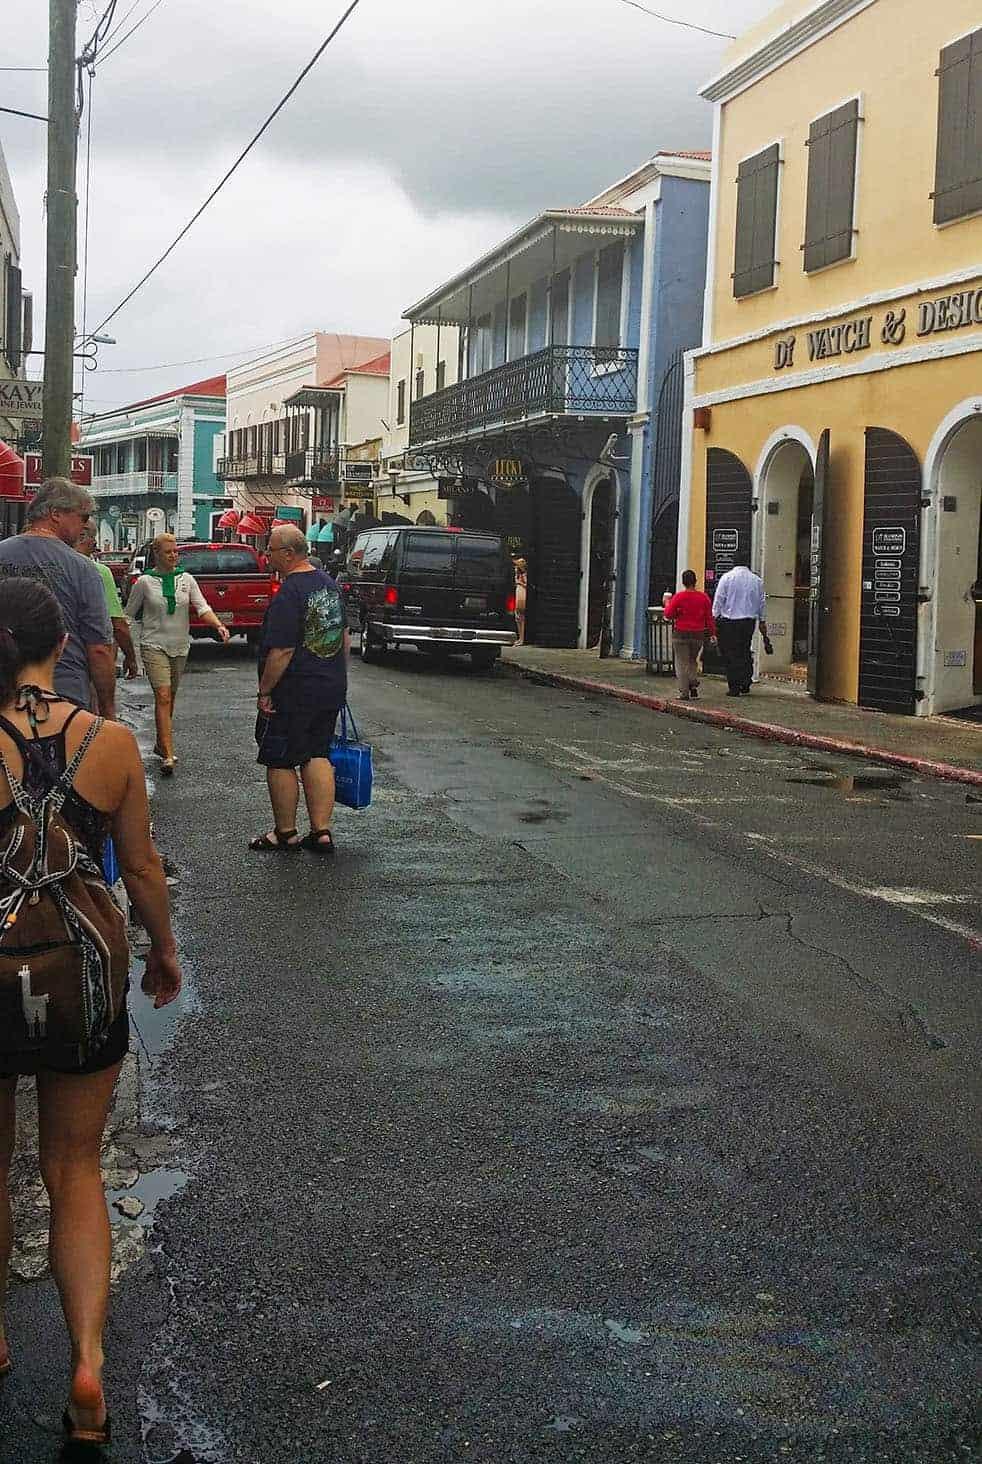 Downtown Charlote Amalie, St. Thomas